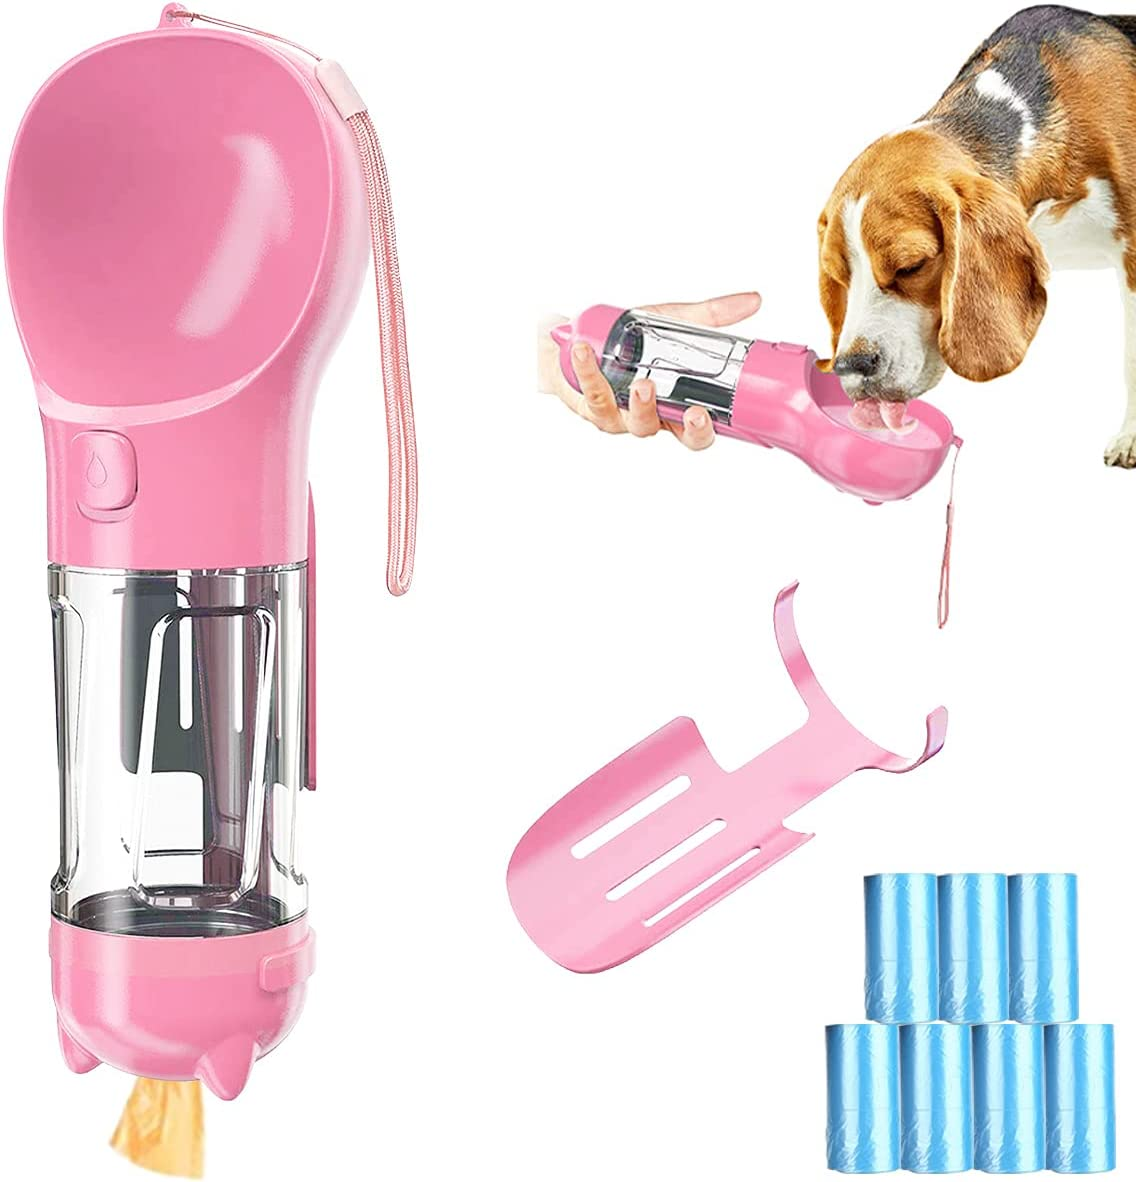 Barrageon Perro Botella Agua Portatil Bebedero Mascotas Beber 300ML Alimentador Comida Envase Banda Pala de Basura 7 Rollos x 350 Bolsas de Excremento Al Aire Libre Paseo Viaje (Rosa)